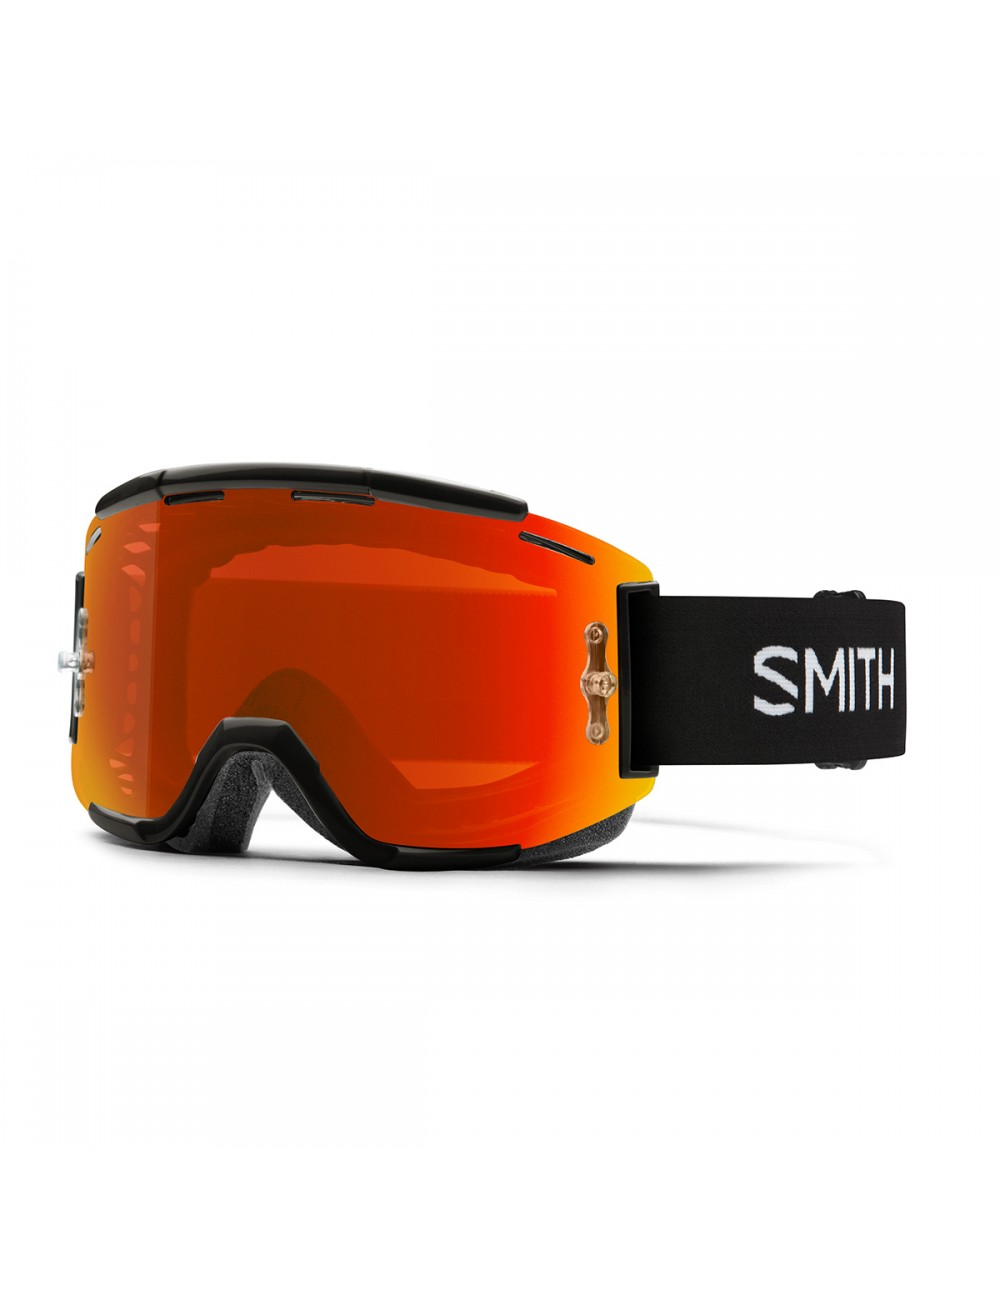 Smith Squad MTB Goggle - Black_12884